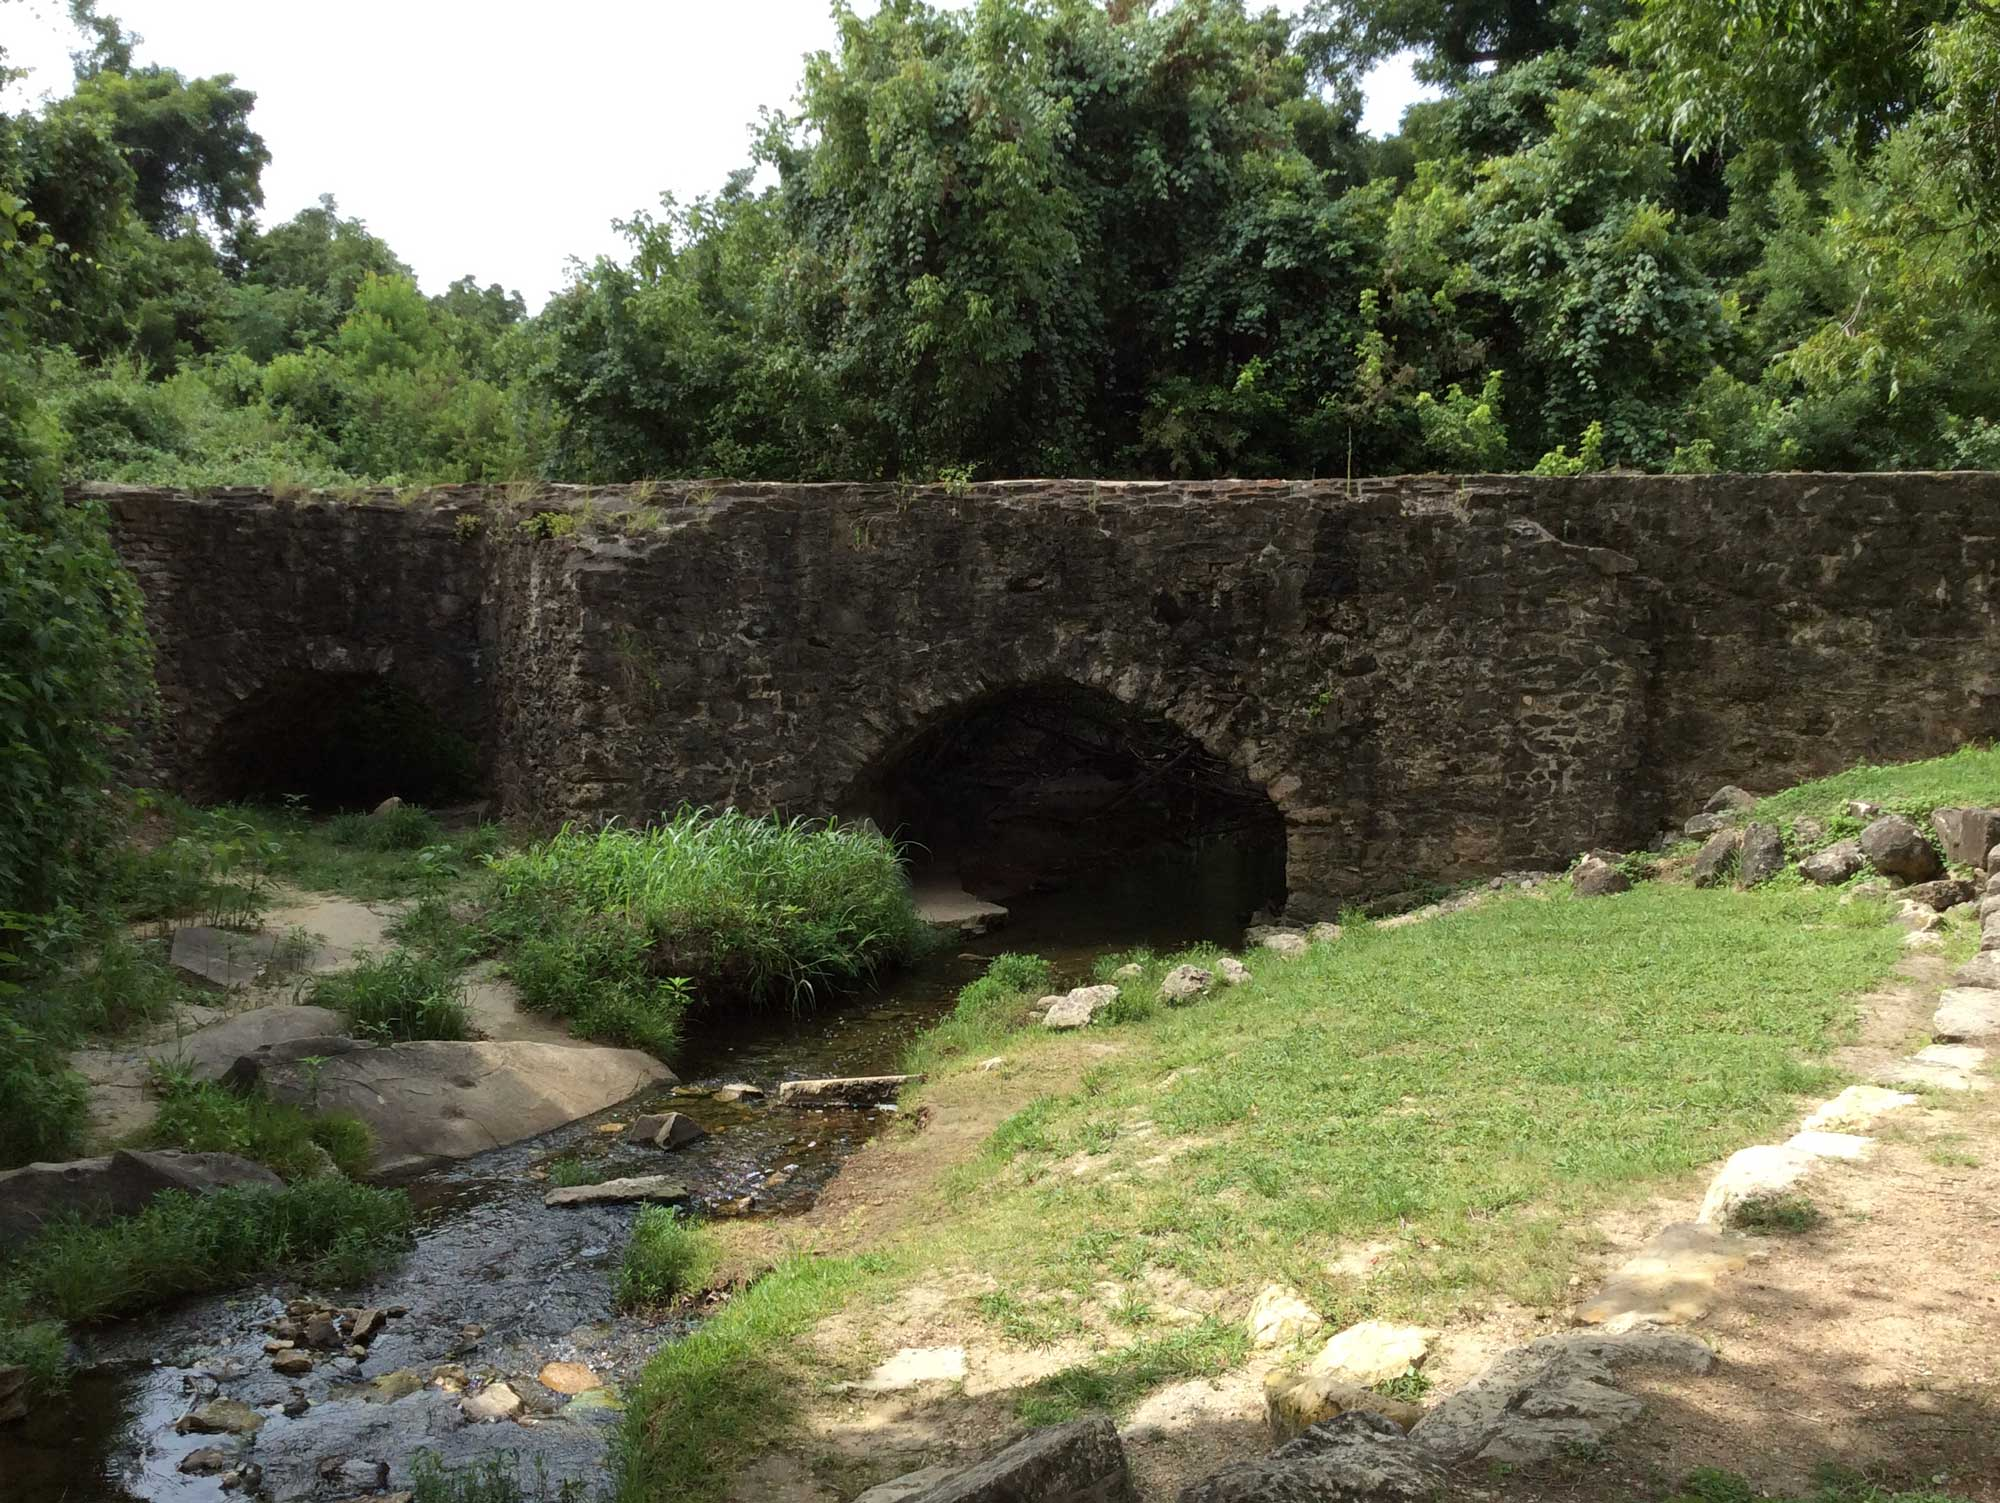 Mission Espada Aqueduct